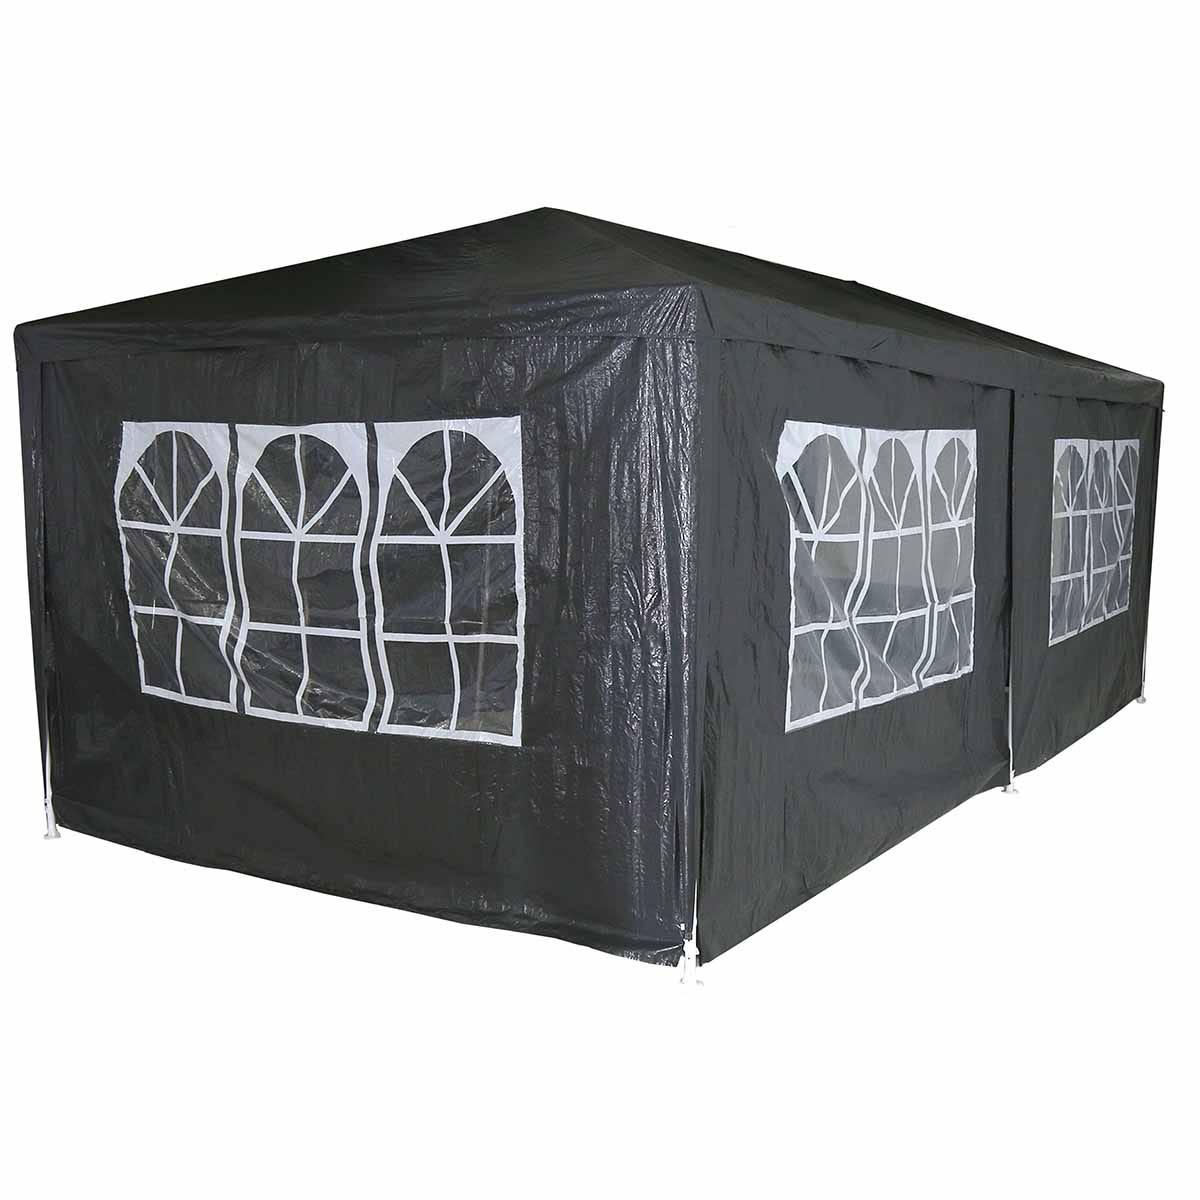 Charles Bentley 3m x 6m Party Tent Gazebo - Dark Grey